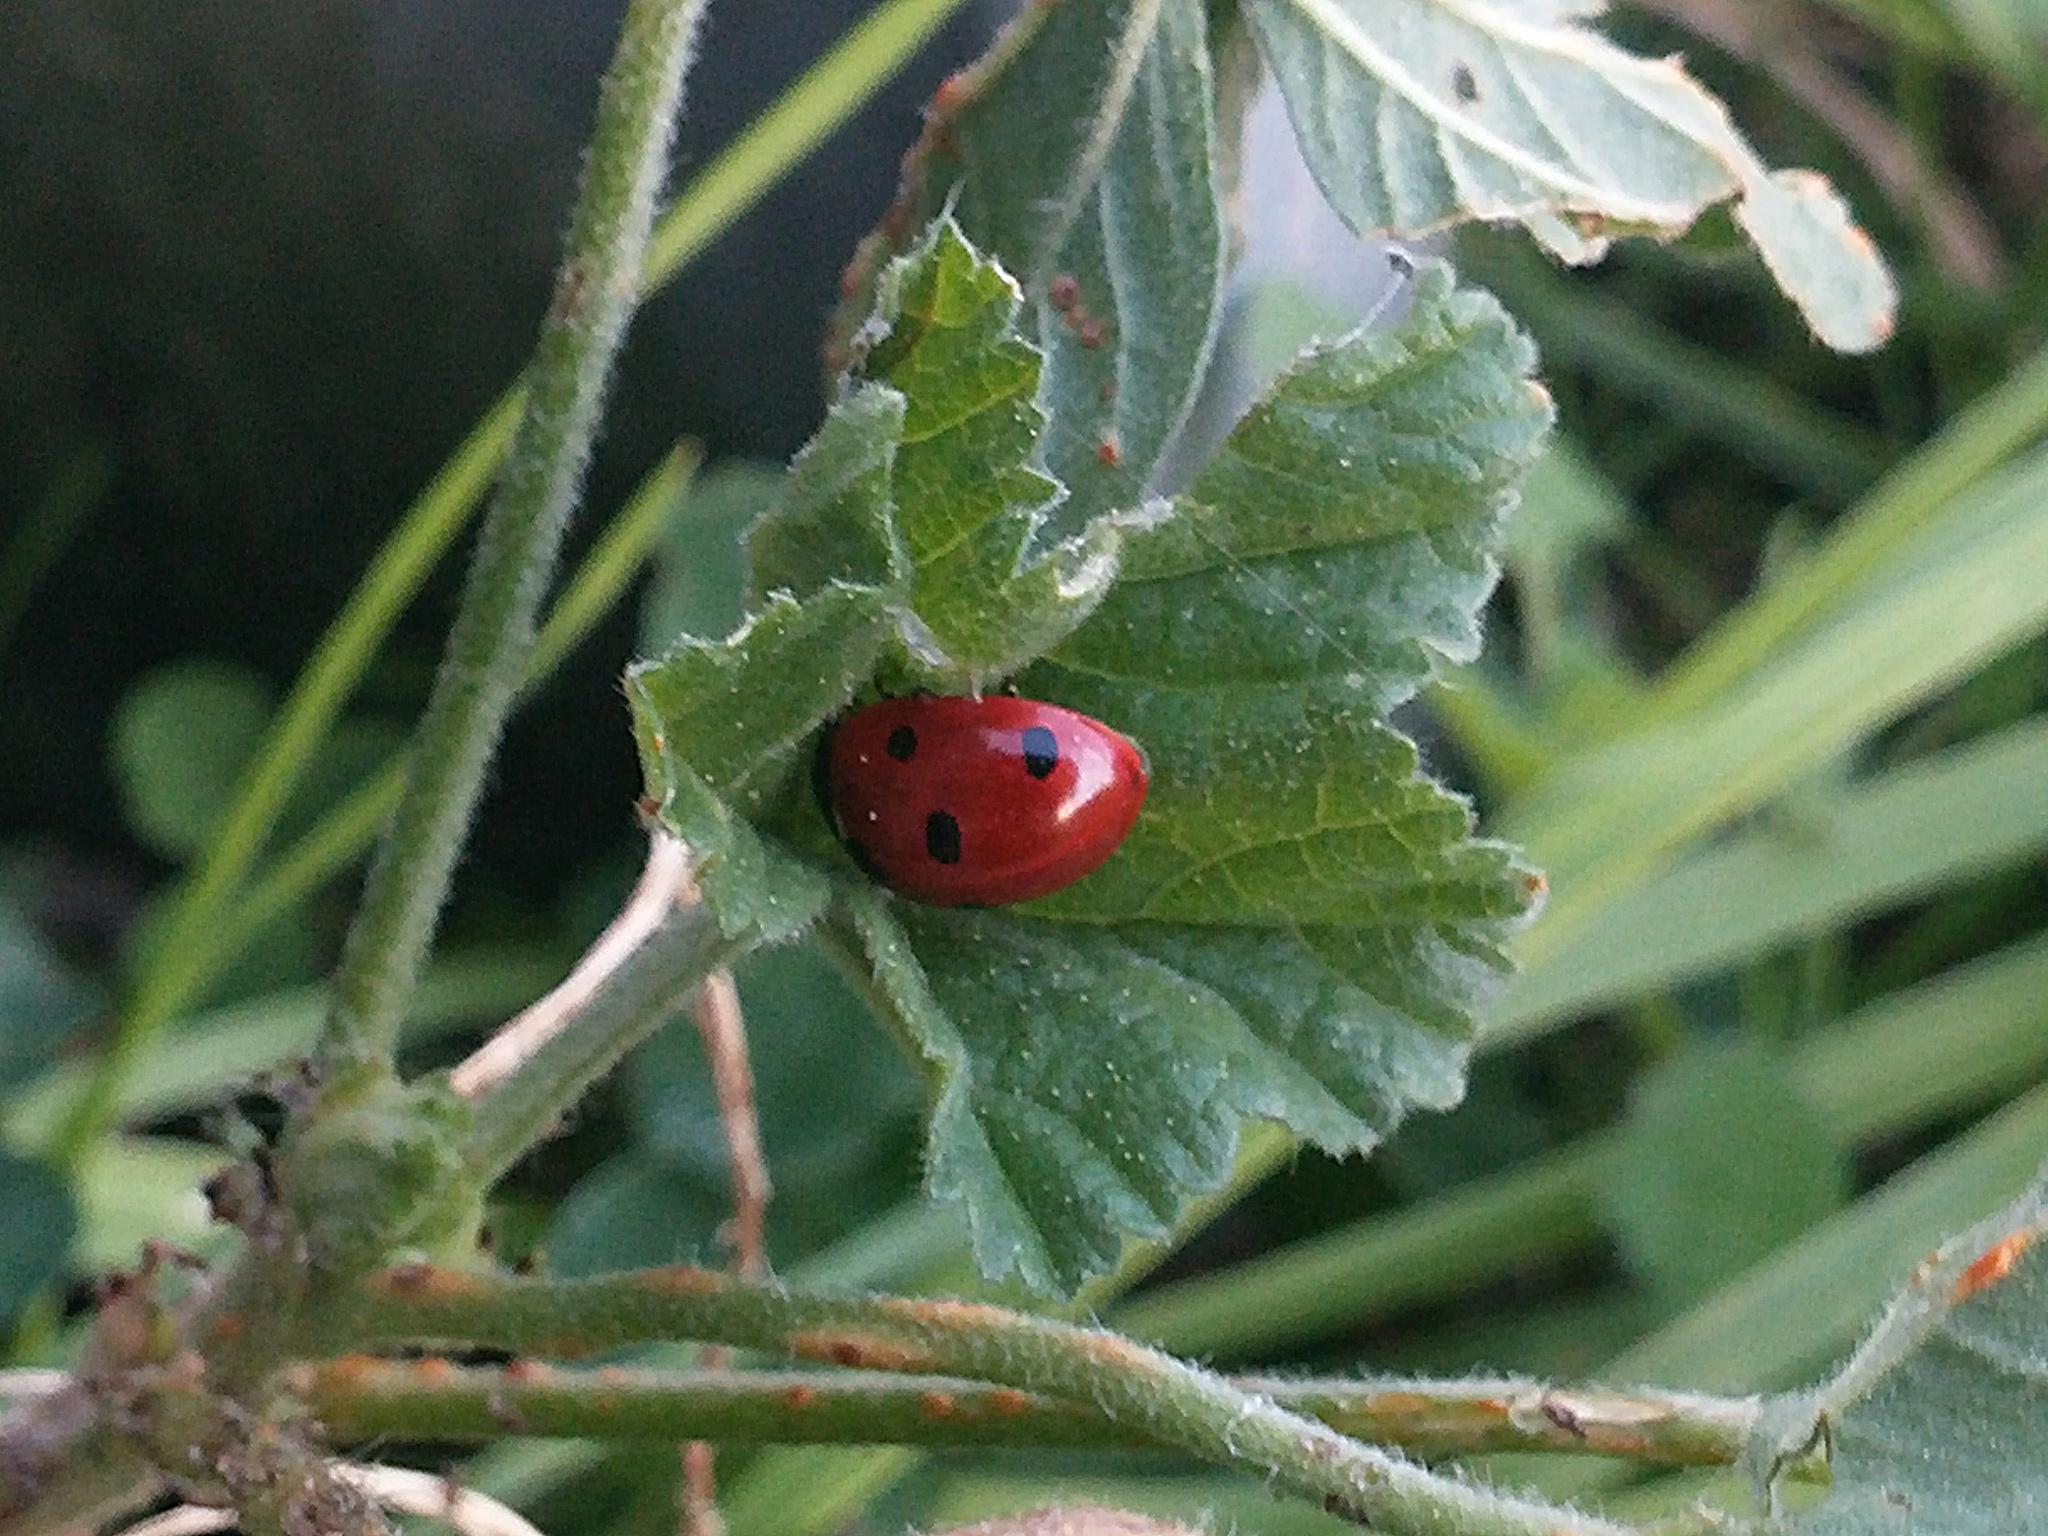 Ladybird by Abbie